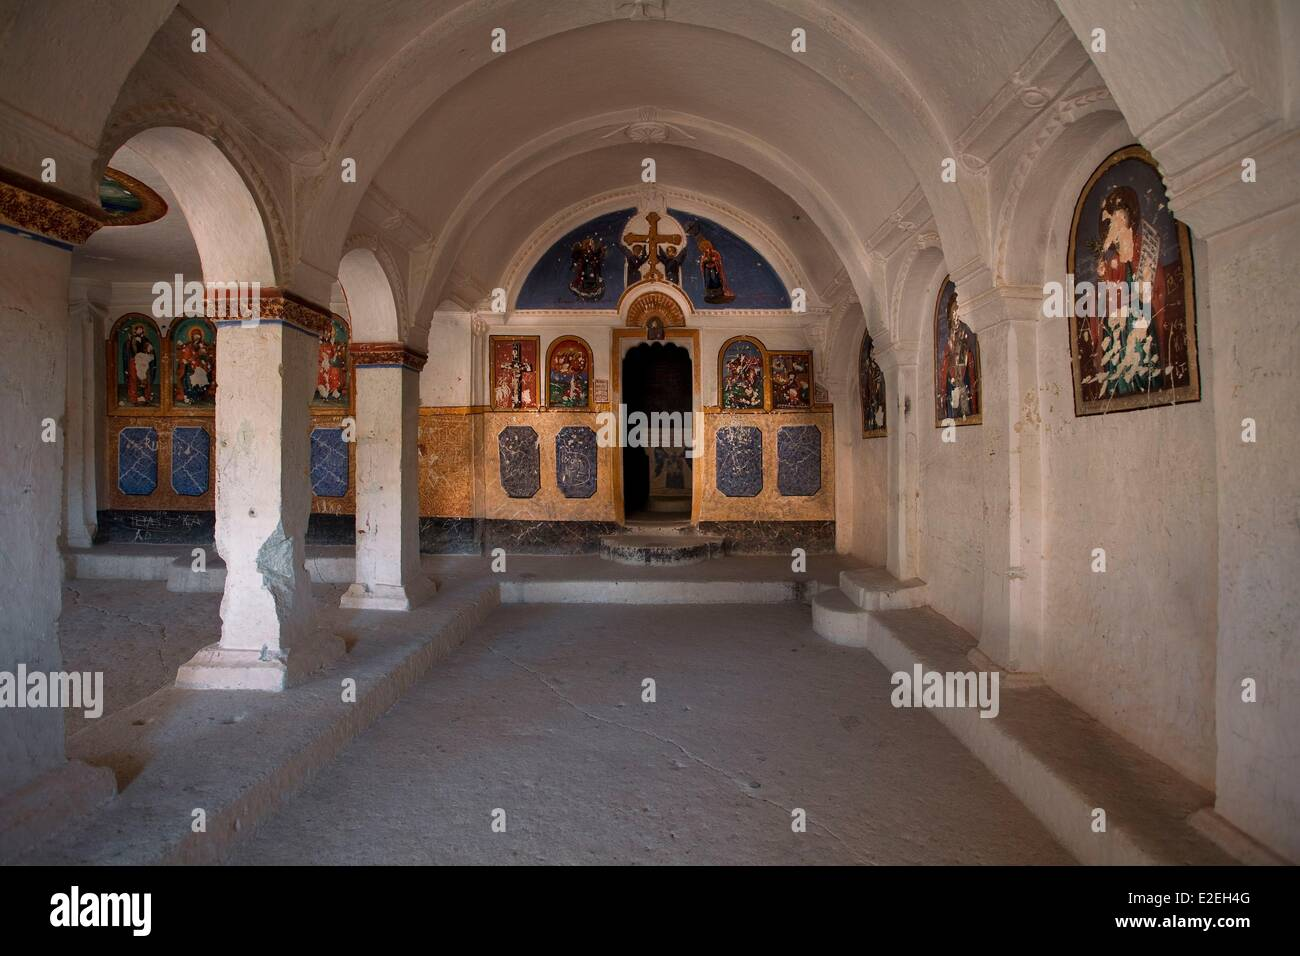 Turkey, Central Anatolia, Capadoccia, Mustafapasa, Saint Vasilyos, listed as World Heritage by the UNESCO - Stock Image